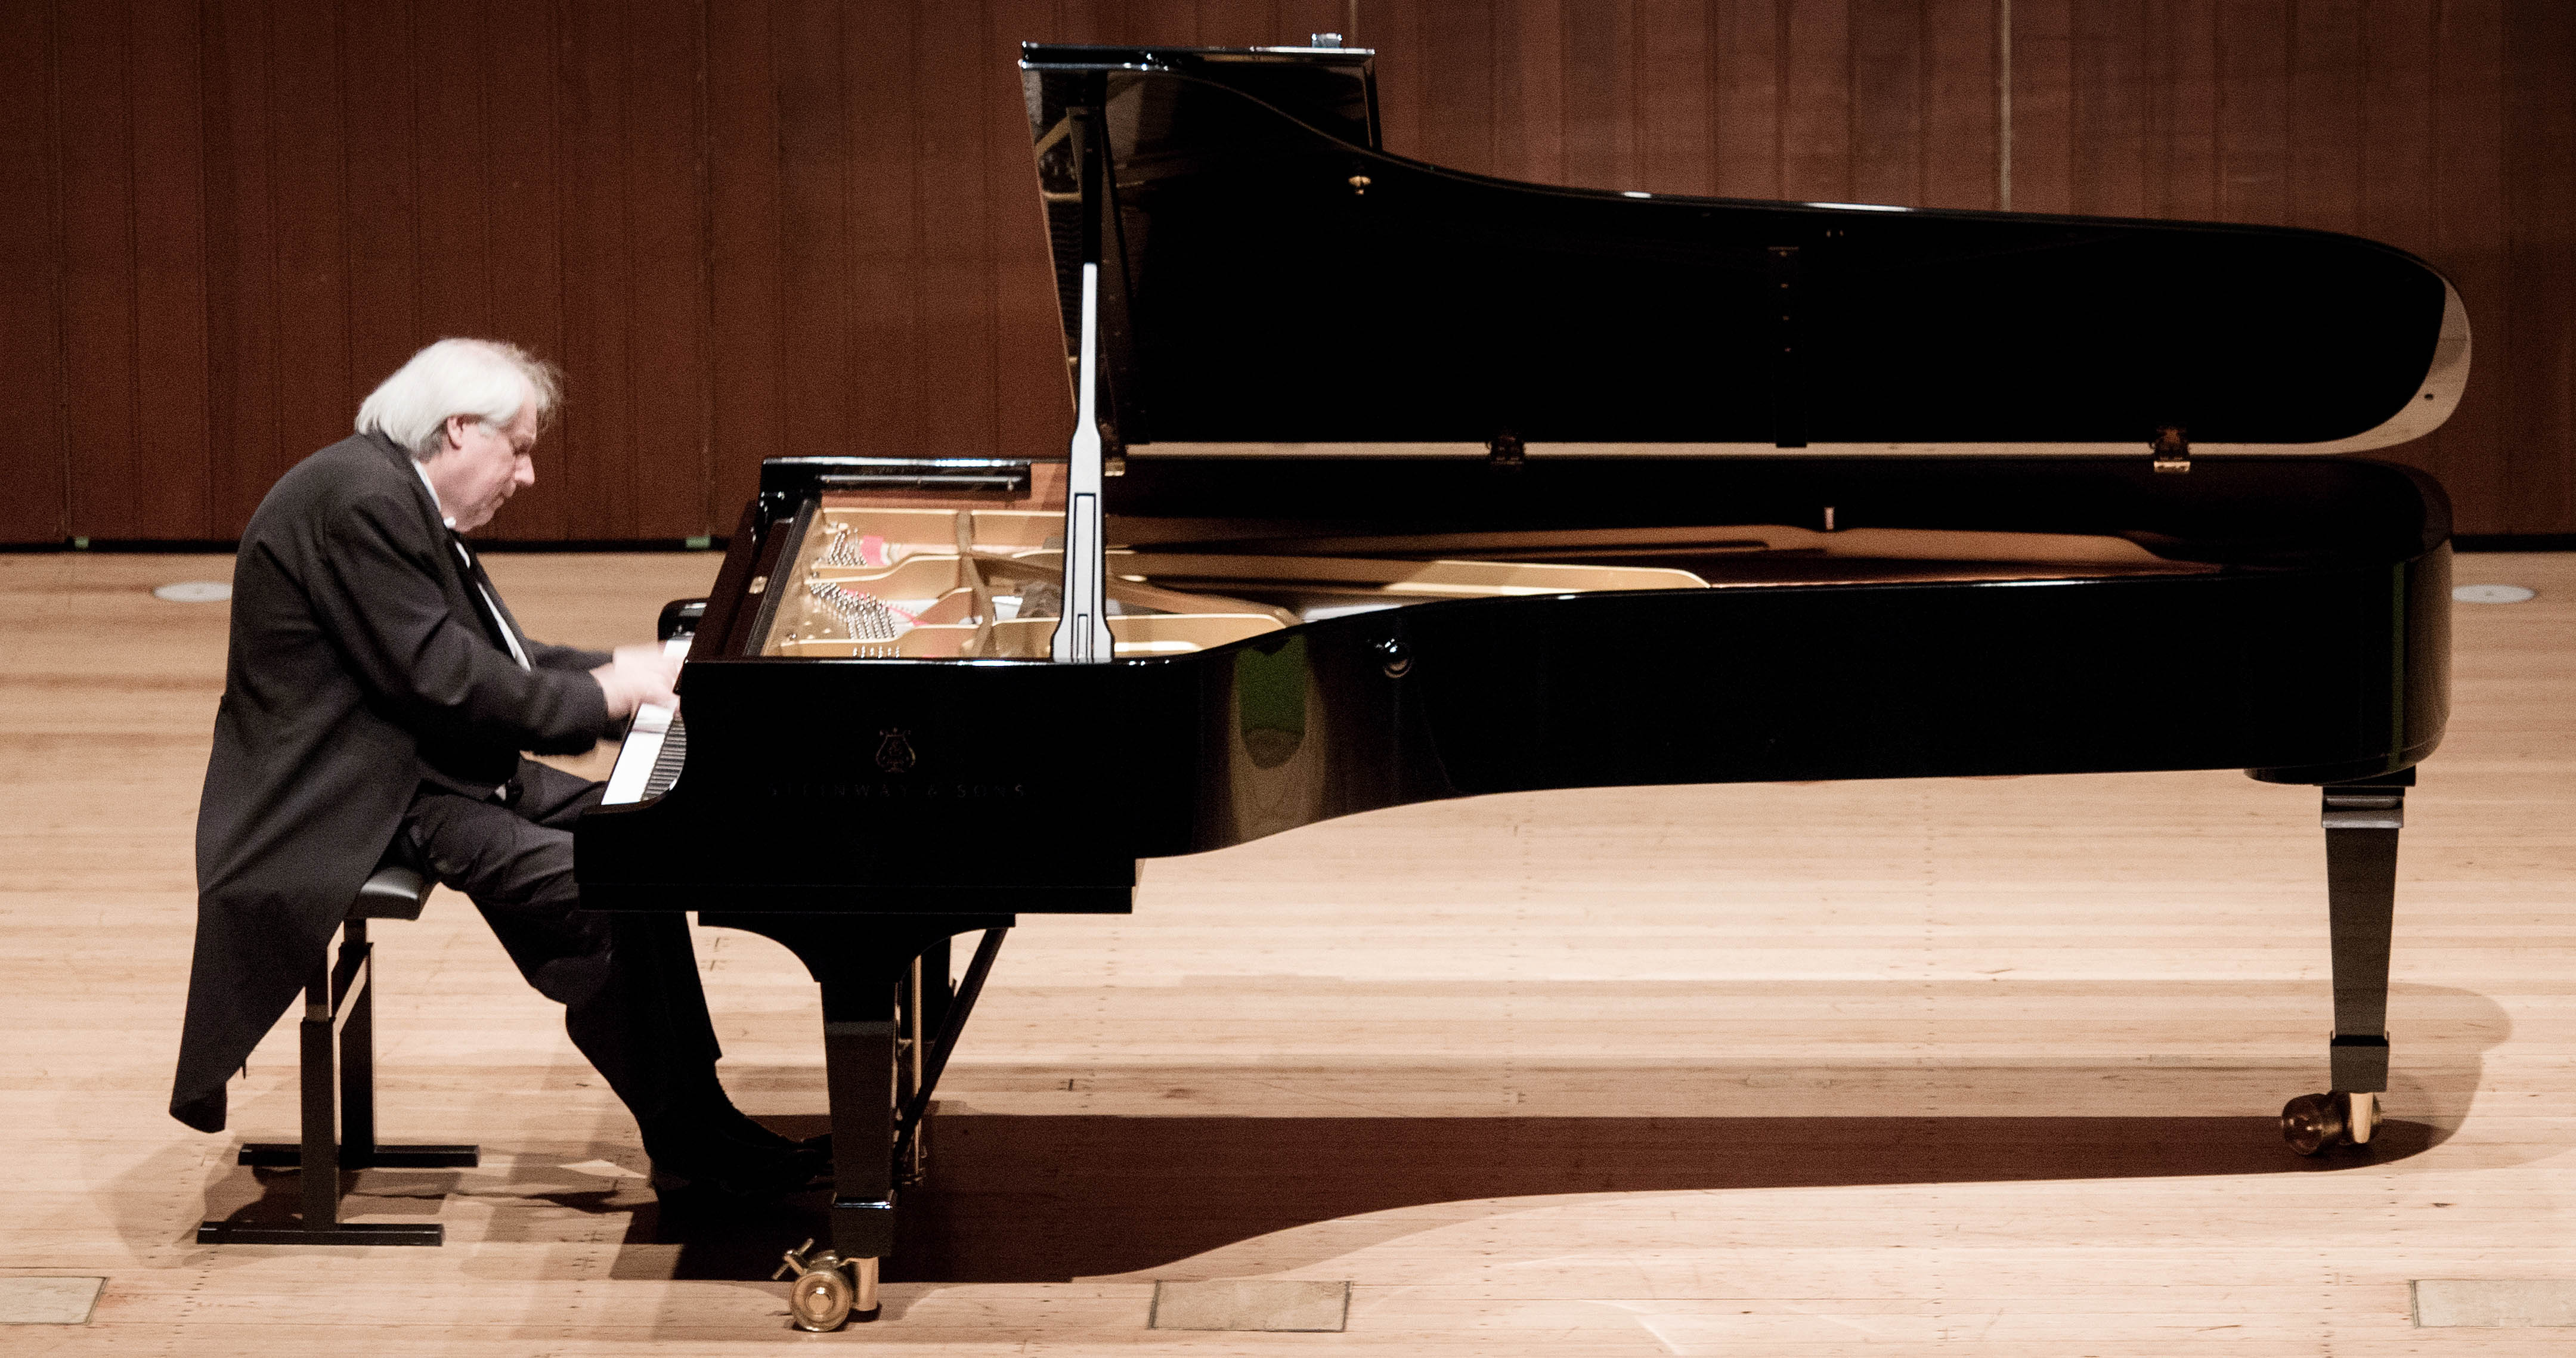 Der Pianist Grigory Sokolov. Bild: studio visuell photography.